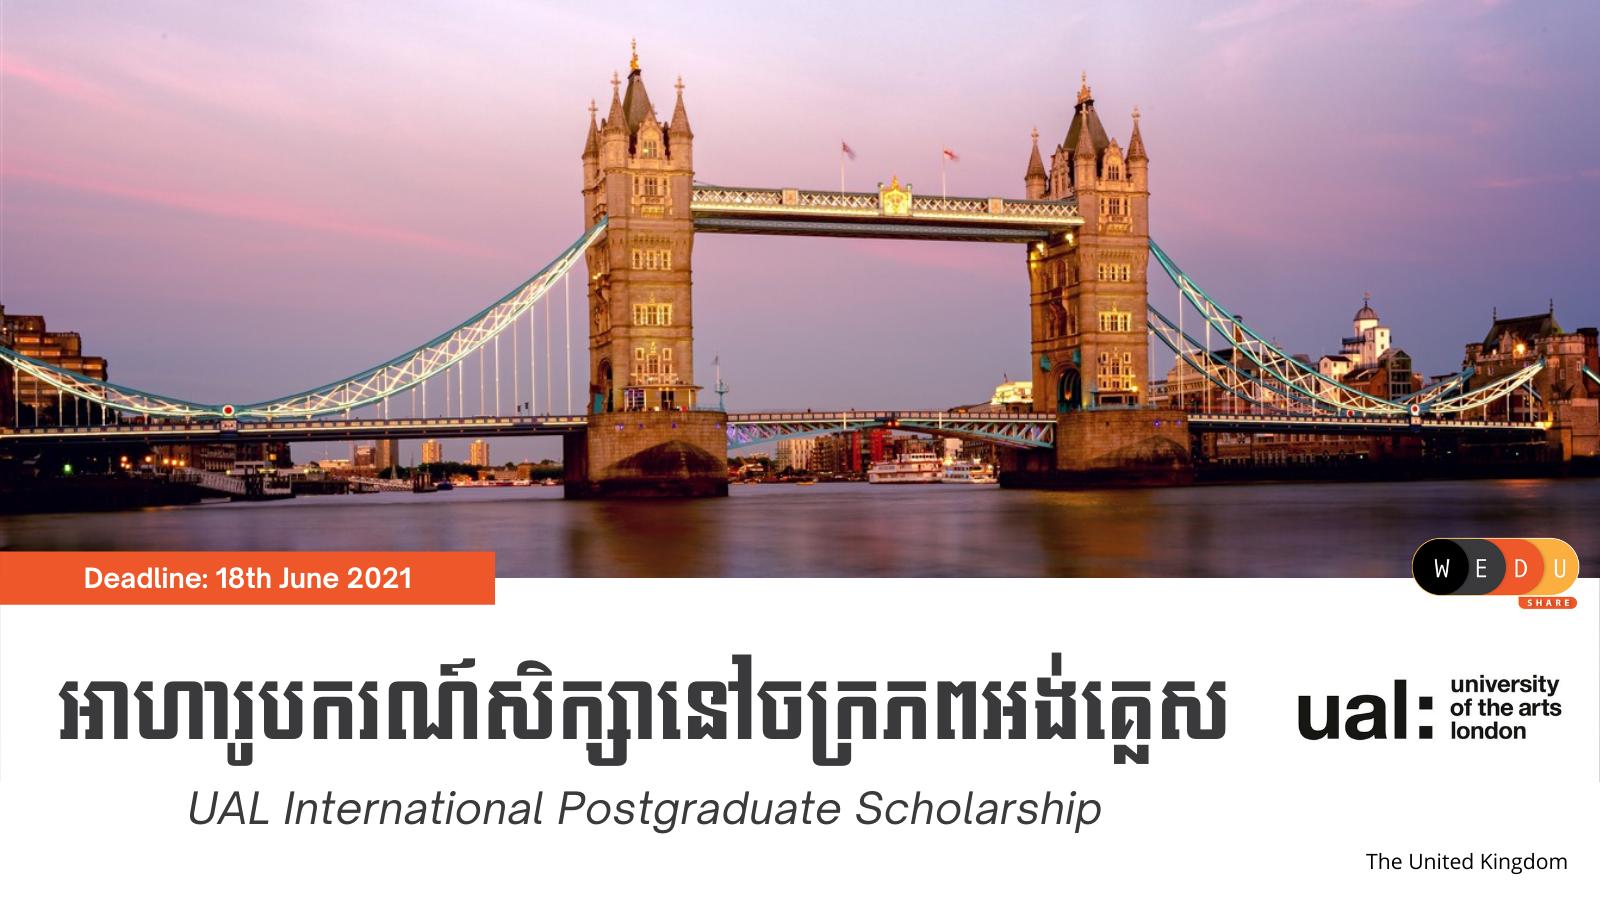 UAL International Postgraduate Scholarship